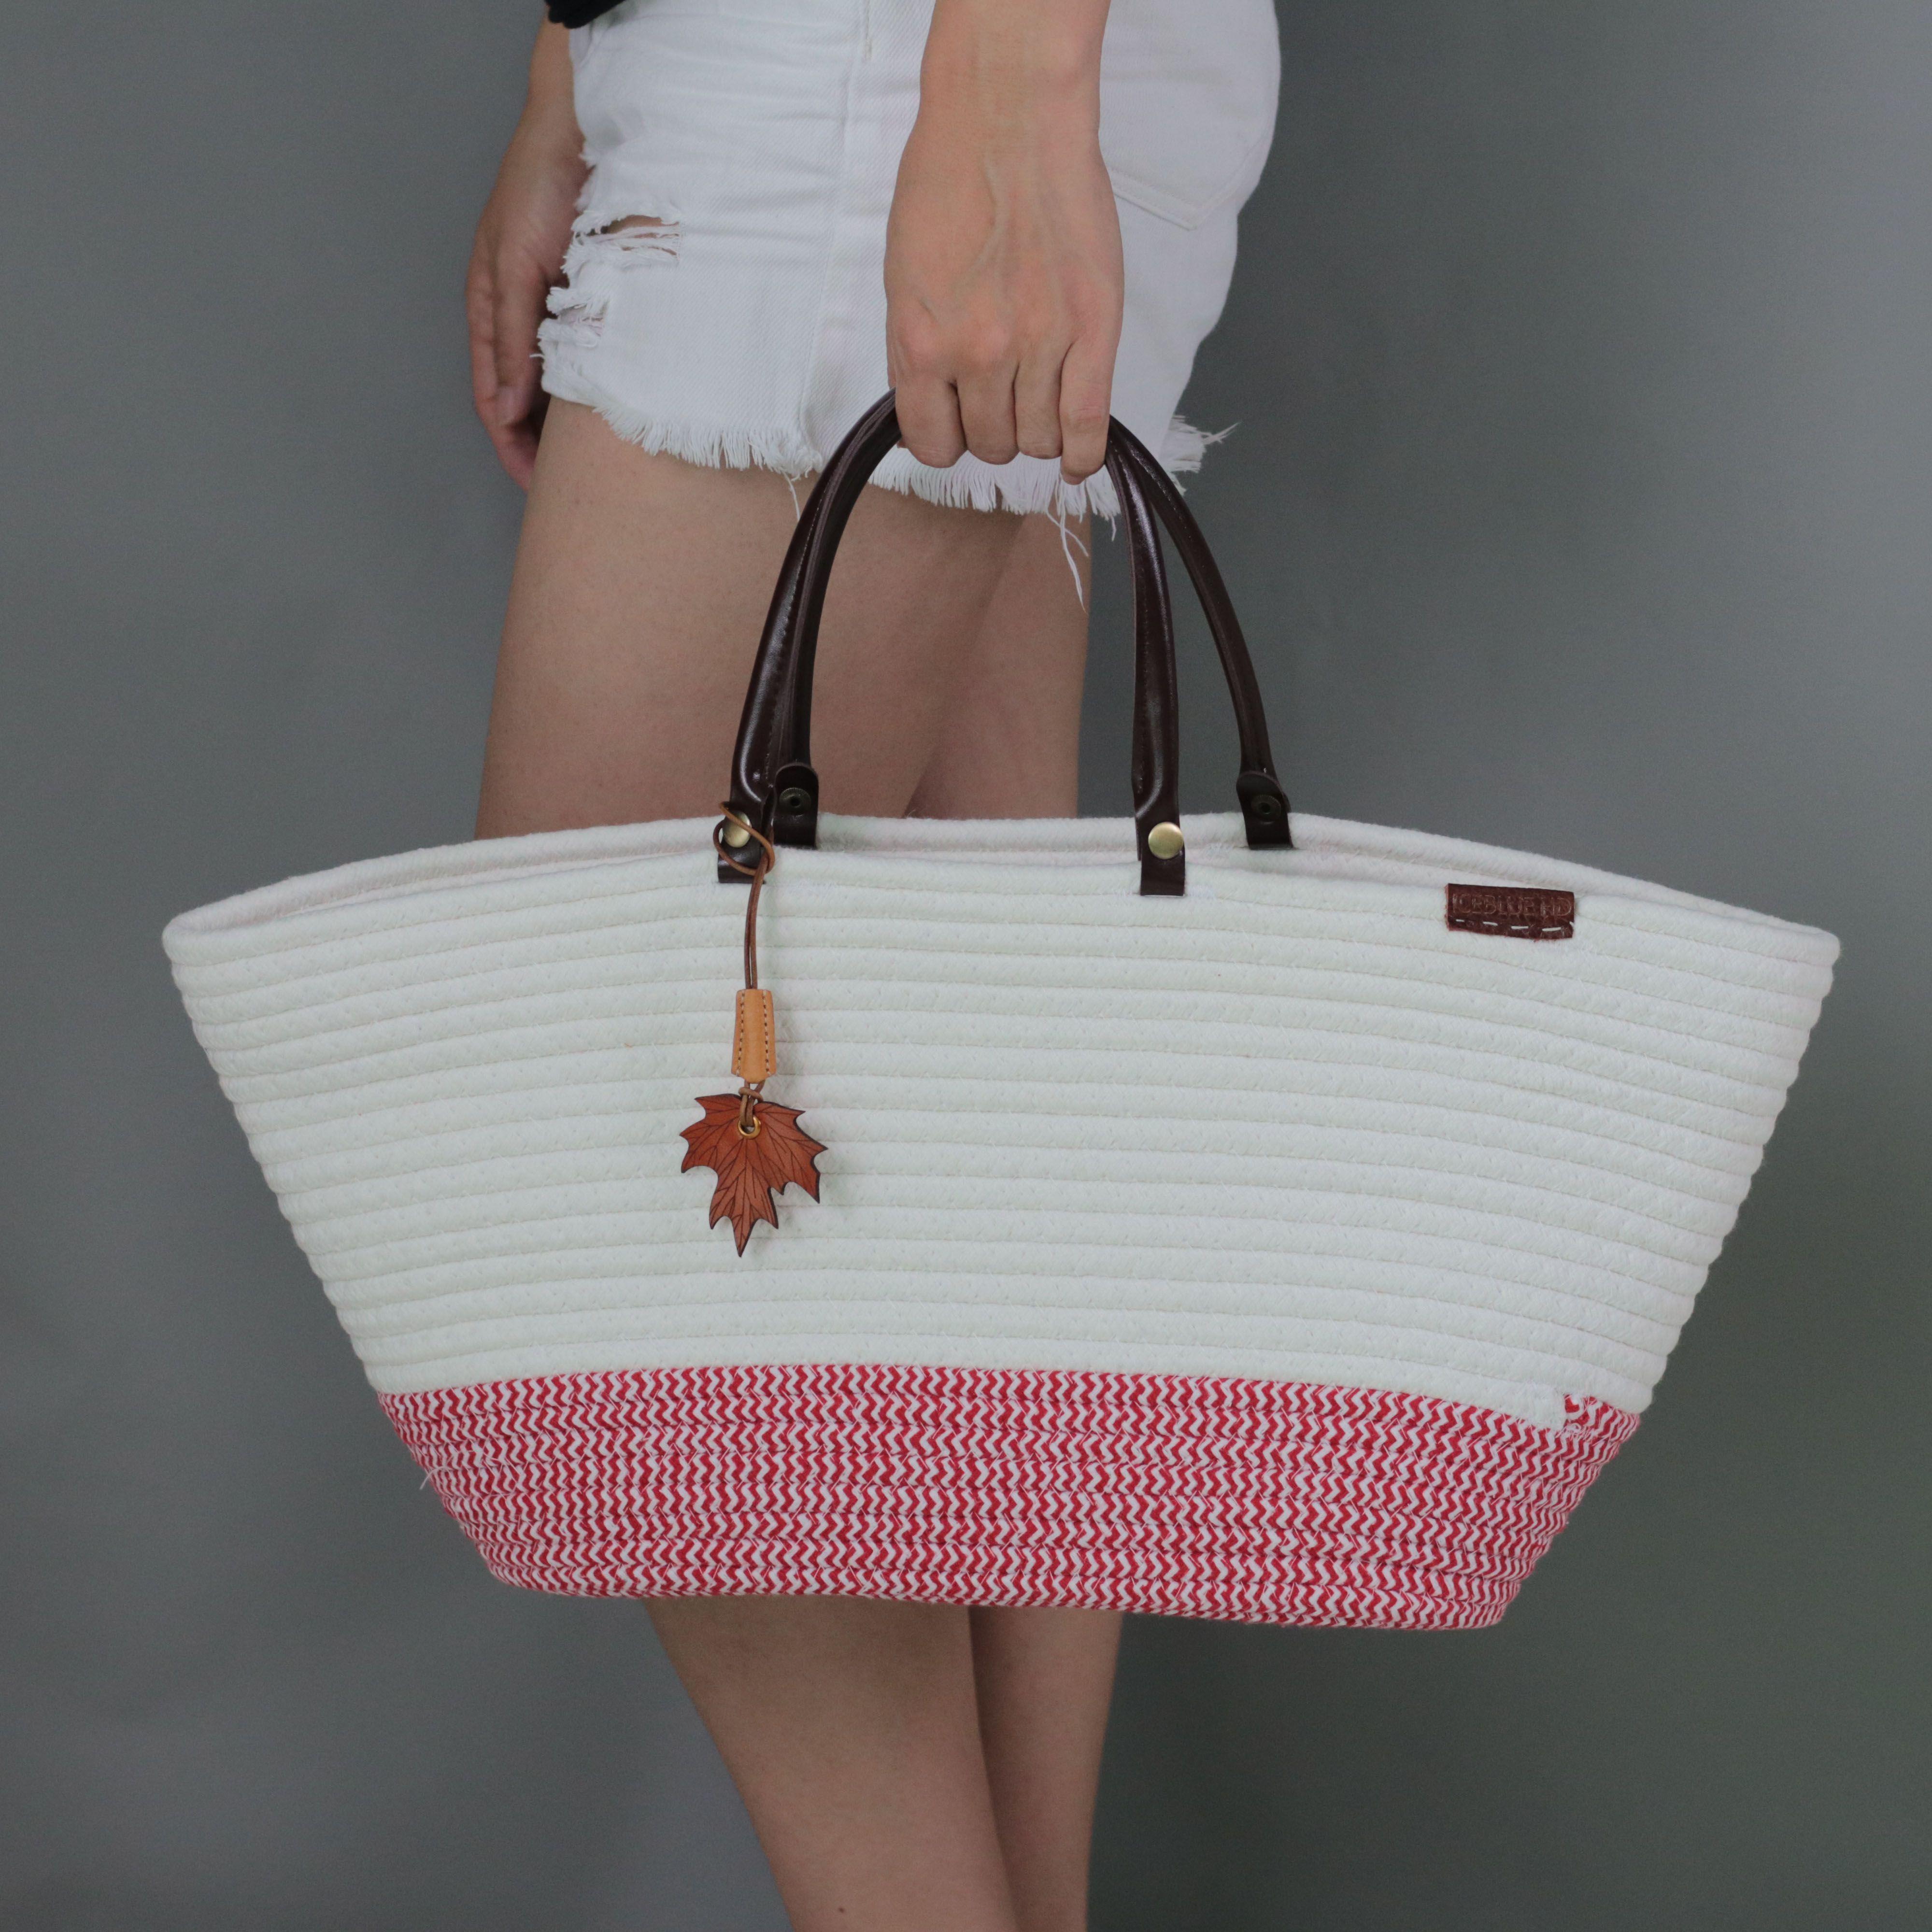 Iceblue beach pool picnic tote bag fashion cotton woven shoulder jpg  4000x4000 Beach picnic tote afe729cdcf6d0